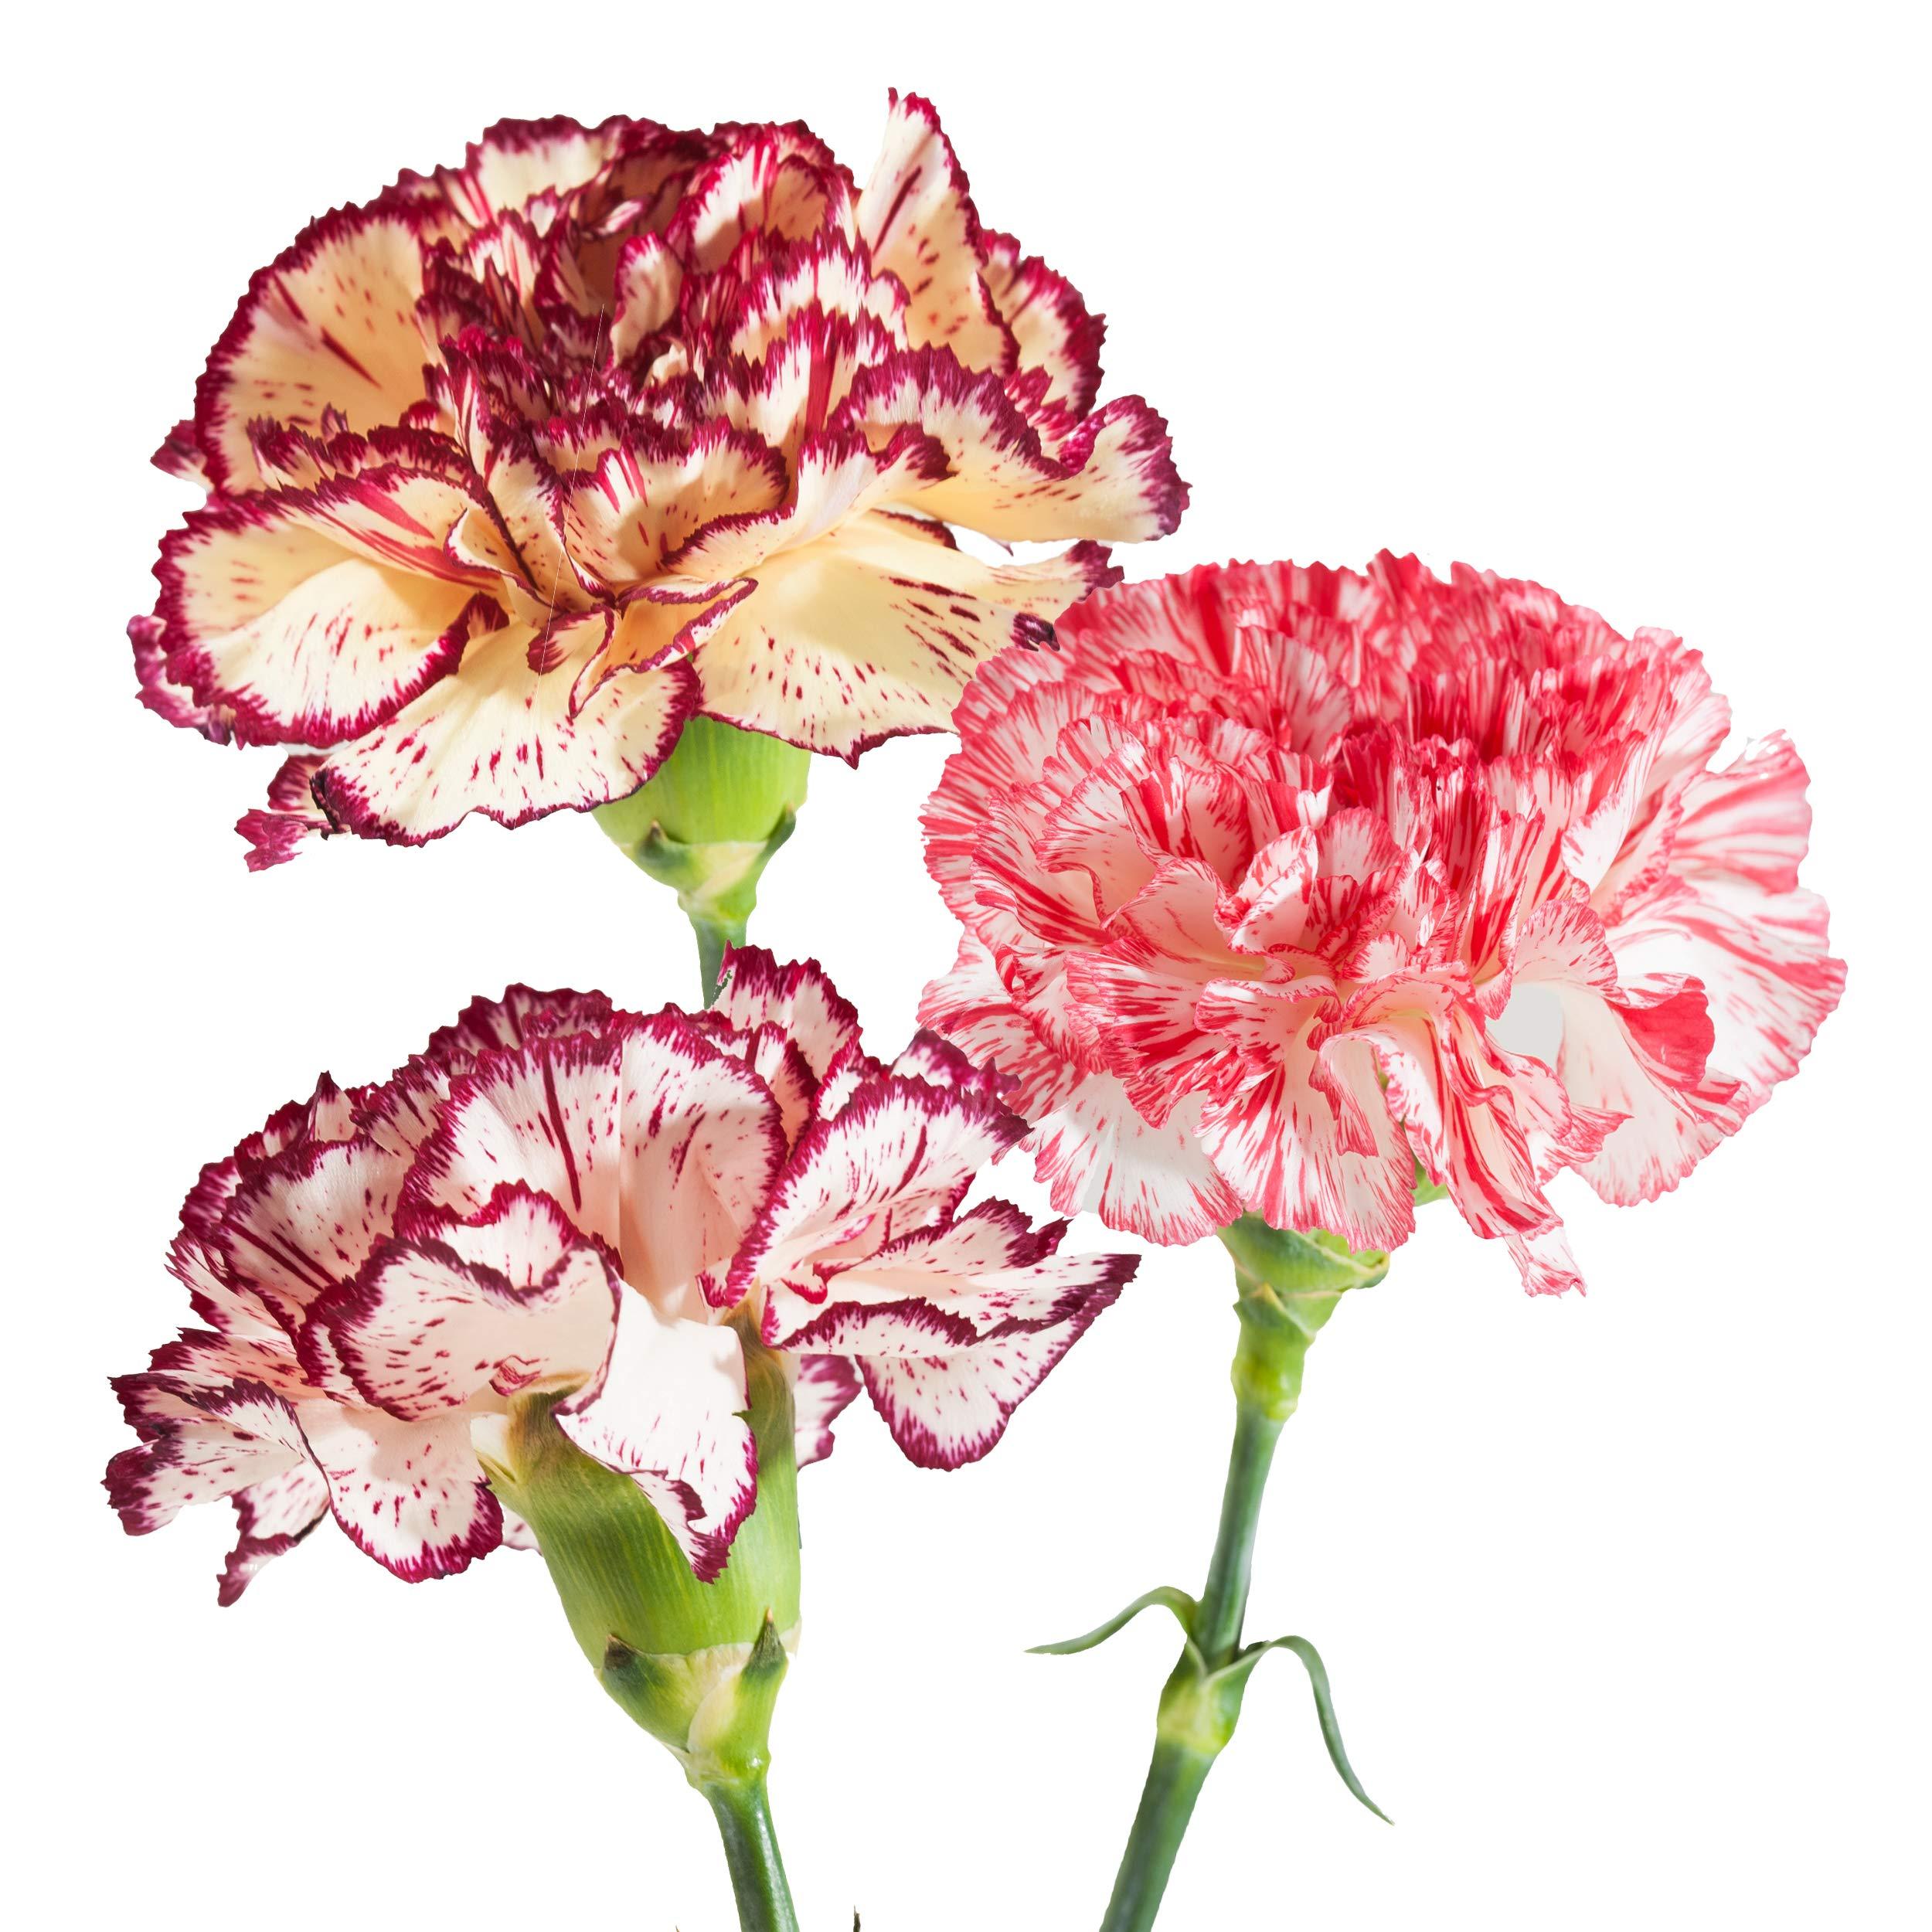 Farm Fresh Natural Novelties Carnation - 100 Stems by Bloomingmore (Image #1)